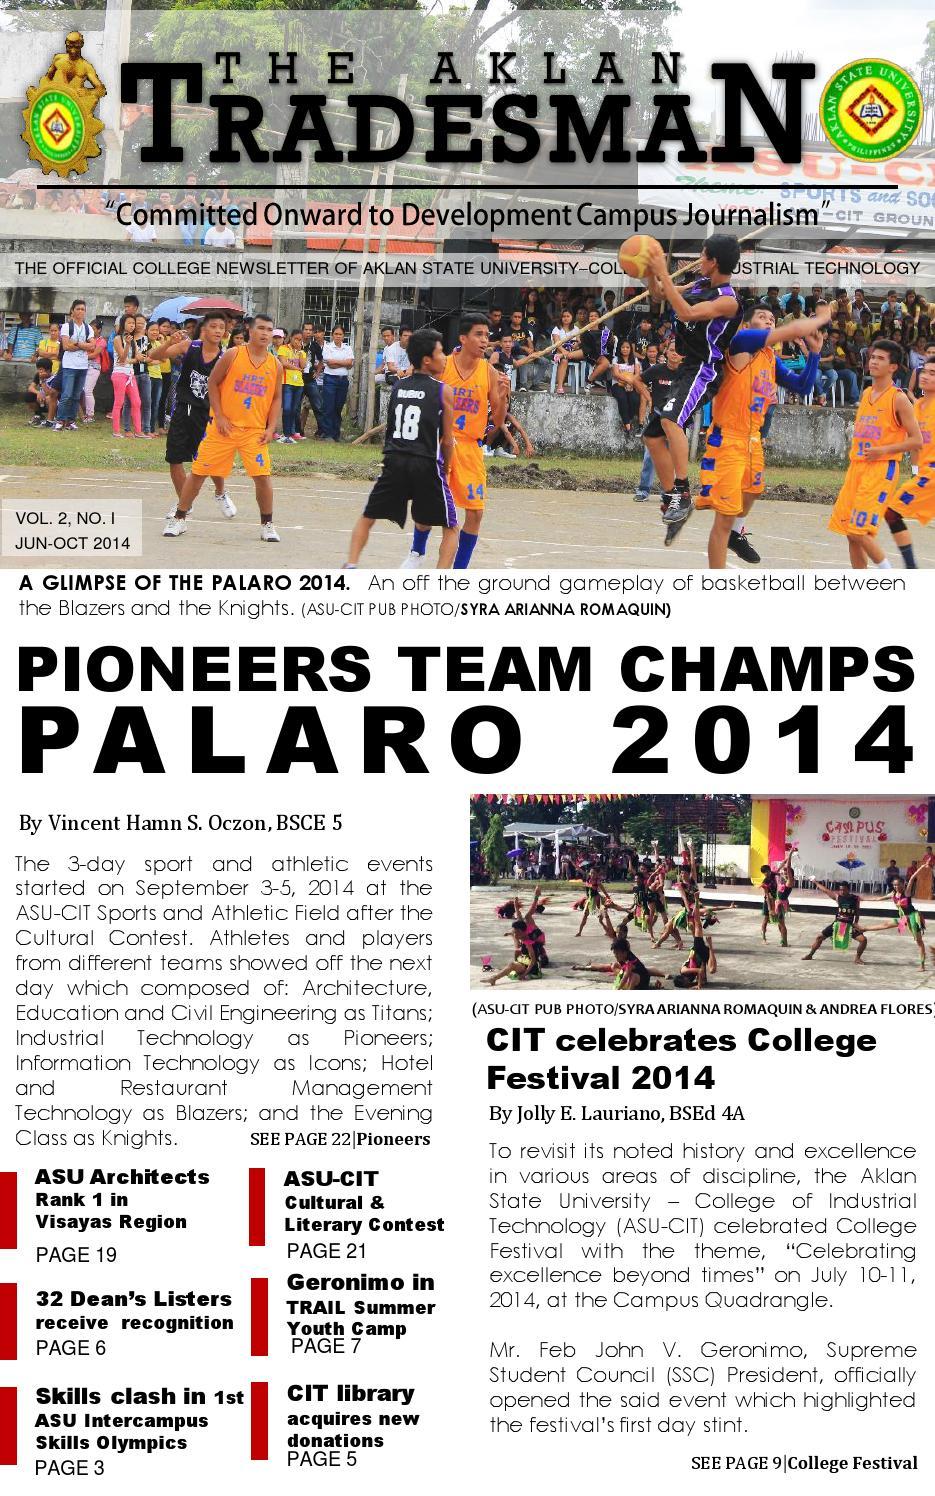 The Aklan Tradesman Newsletter (Volume 2, no 1, AY 2014-2015